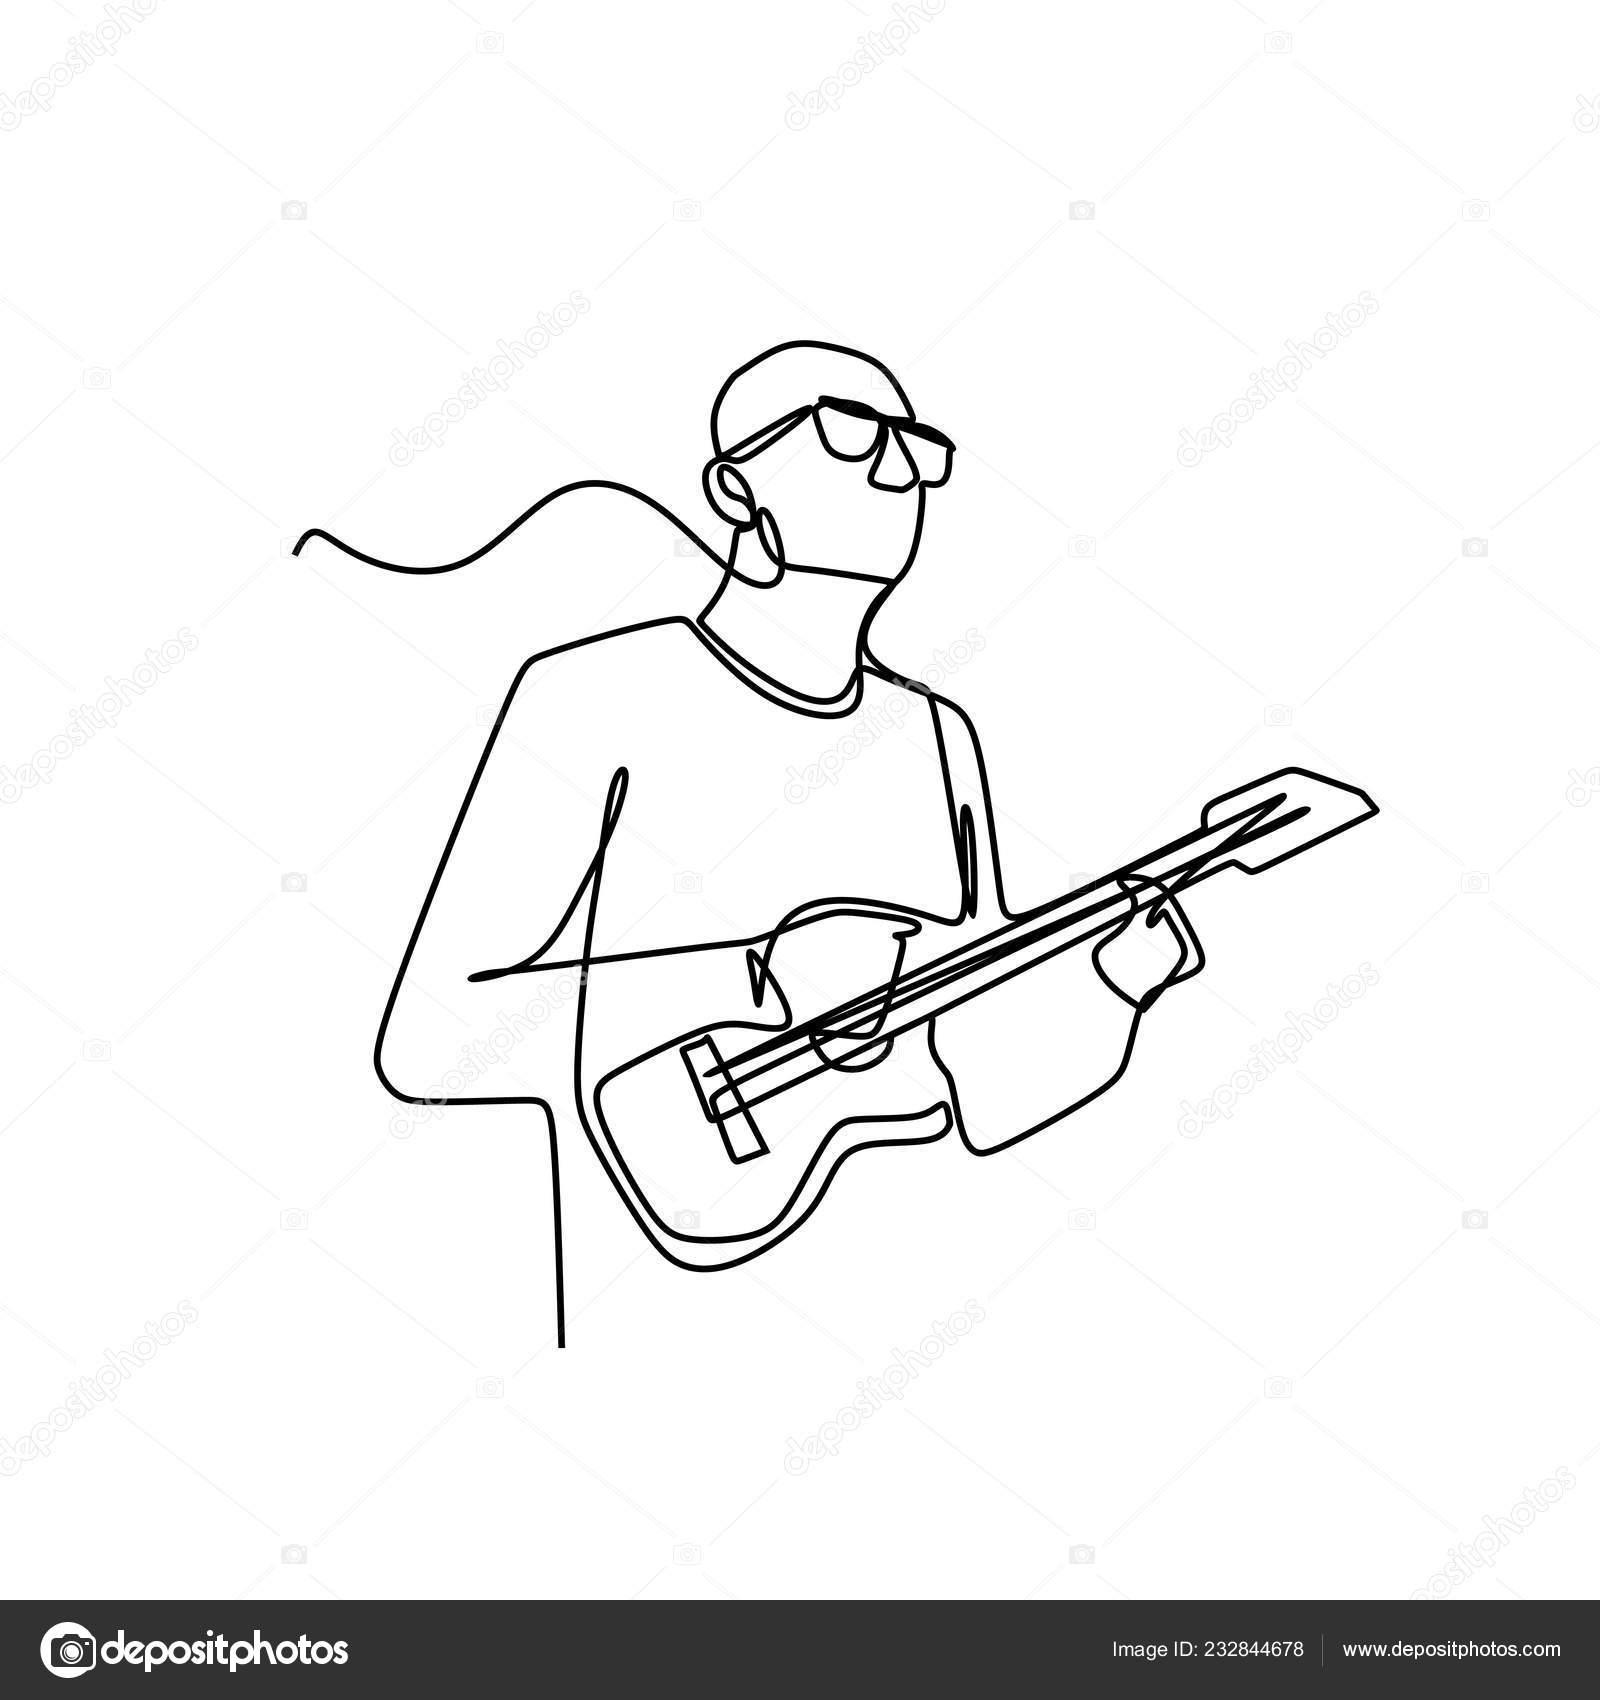 Jedna Kresba Muzske Muze Hrat Ukulele Kytara Vektorove Ilustrace